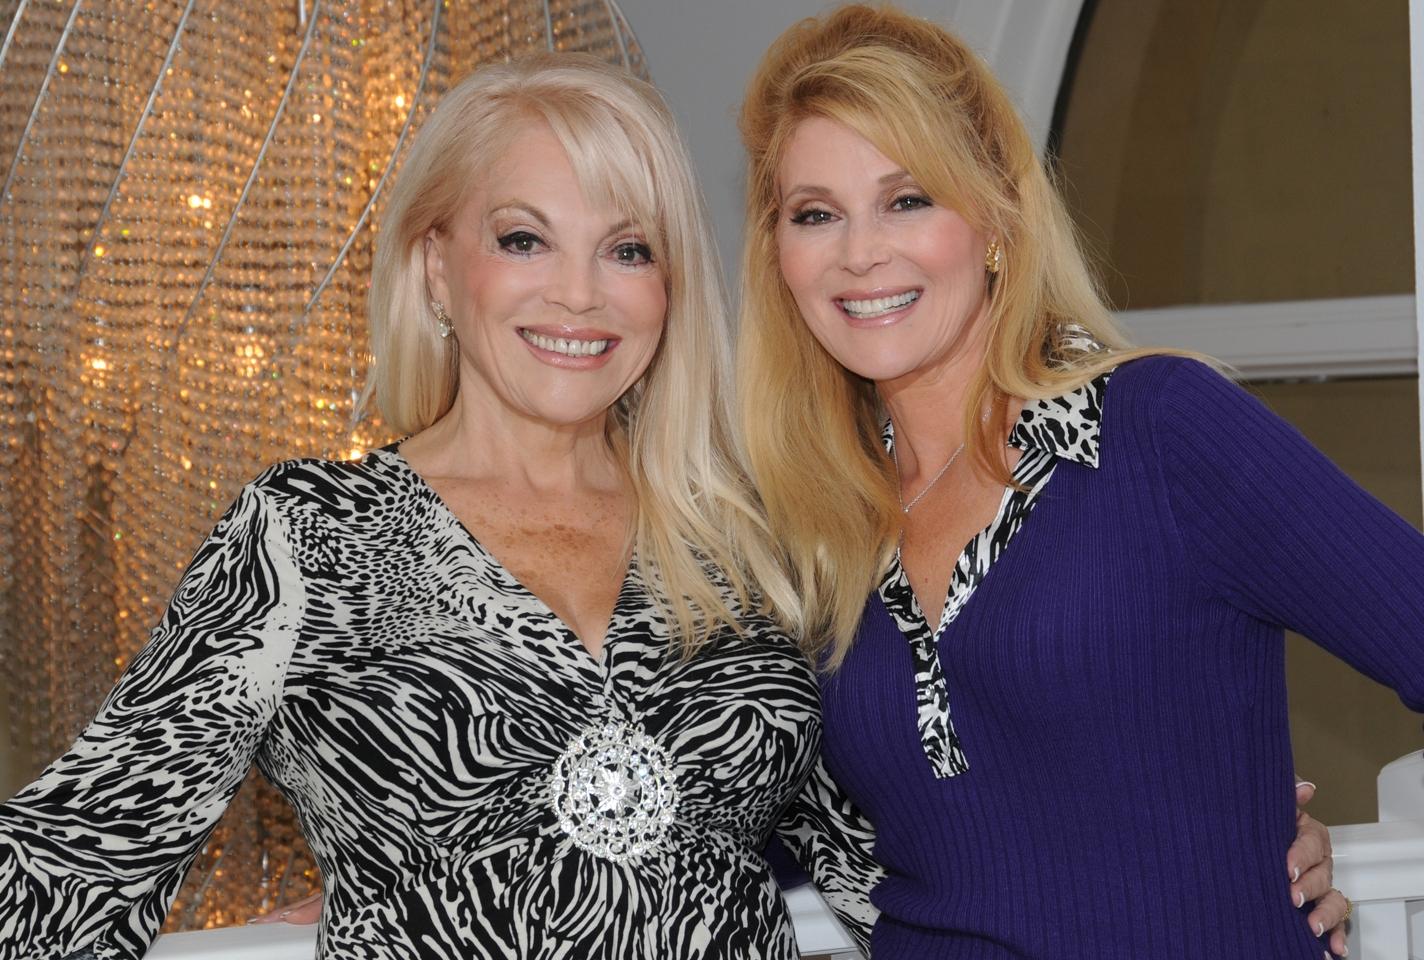 Audrey Landers Dallas tv star audrey landers takes on new role as fashion designer